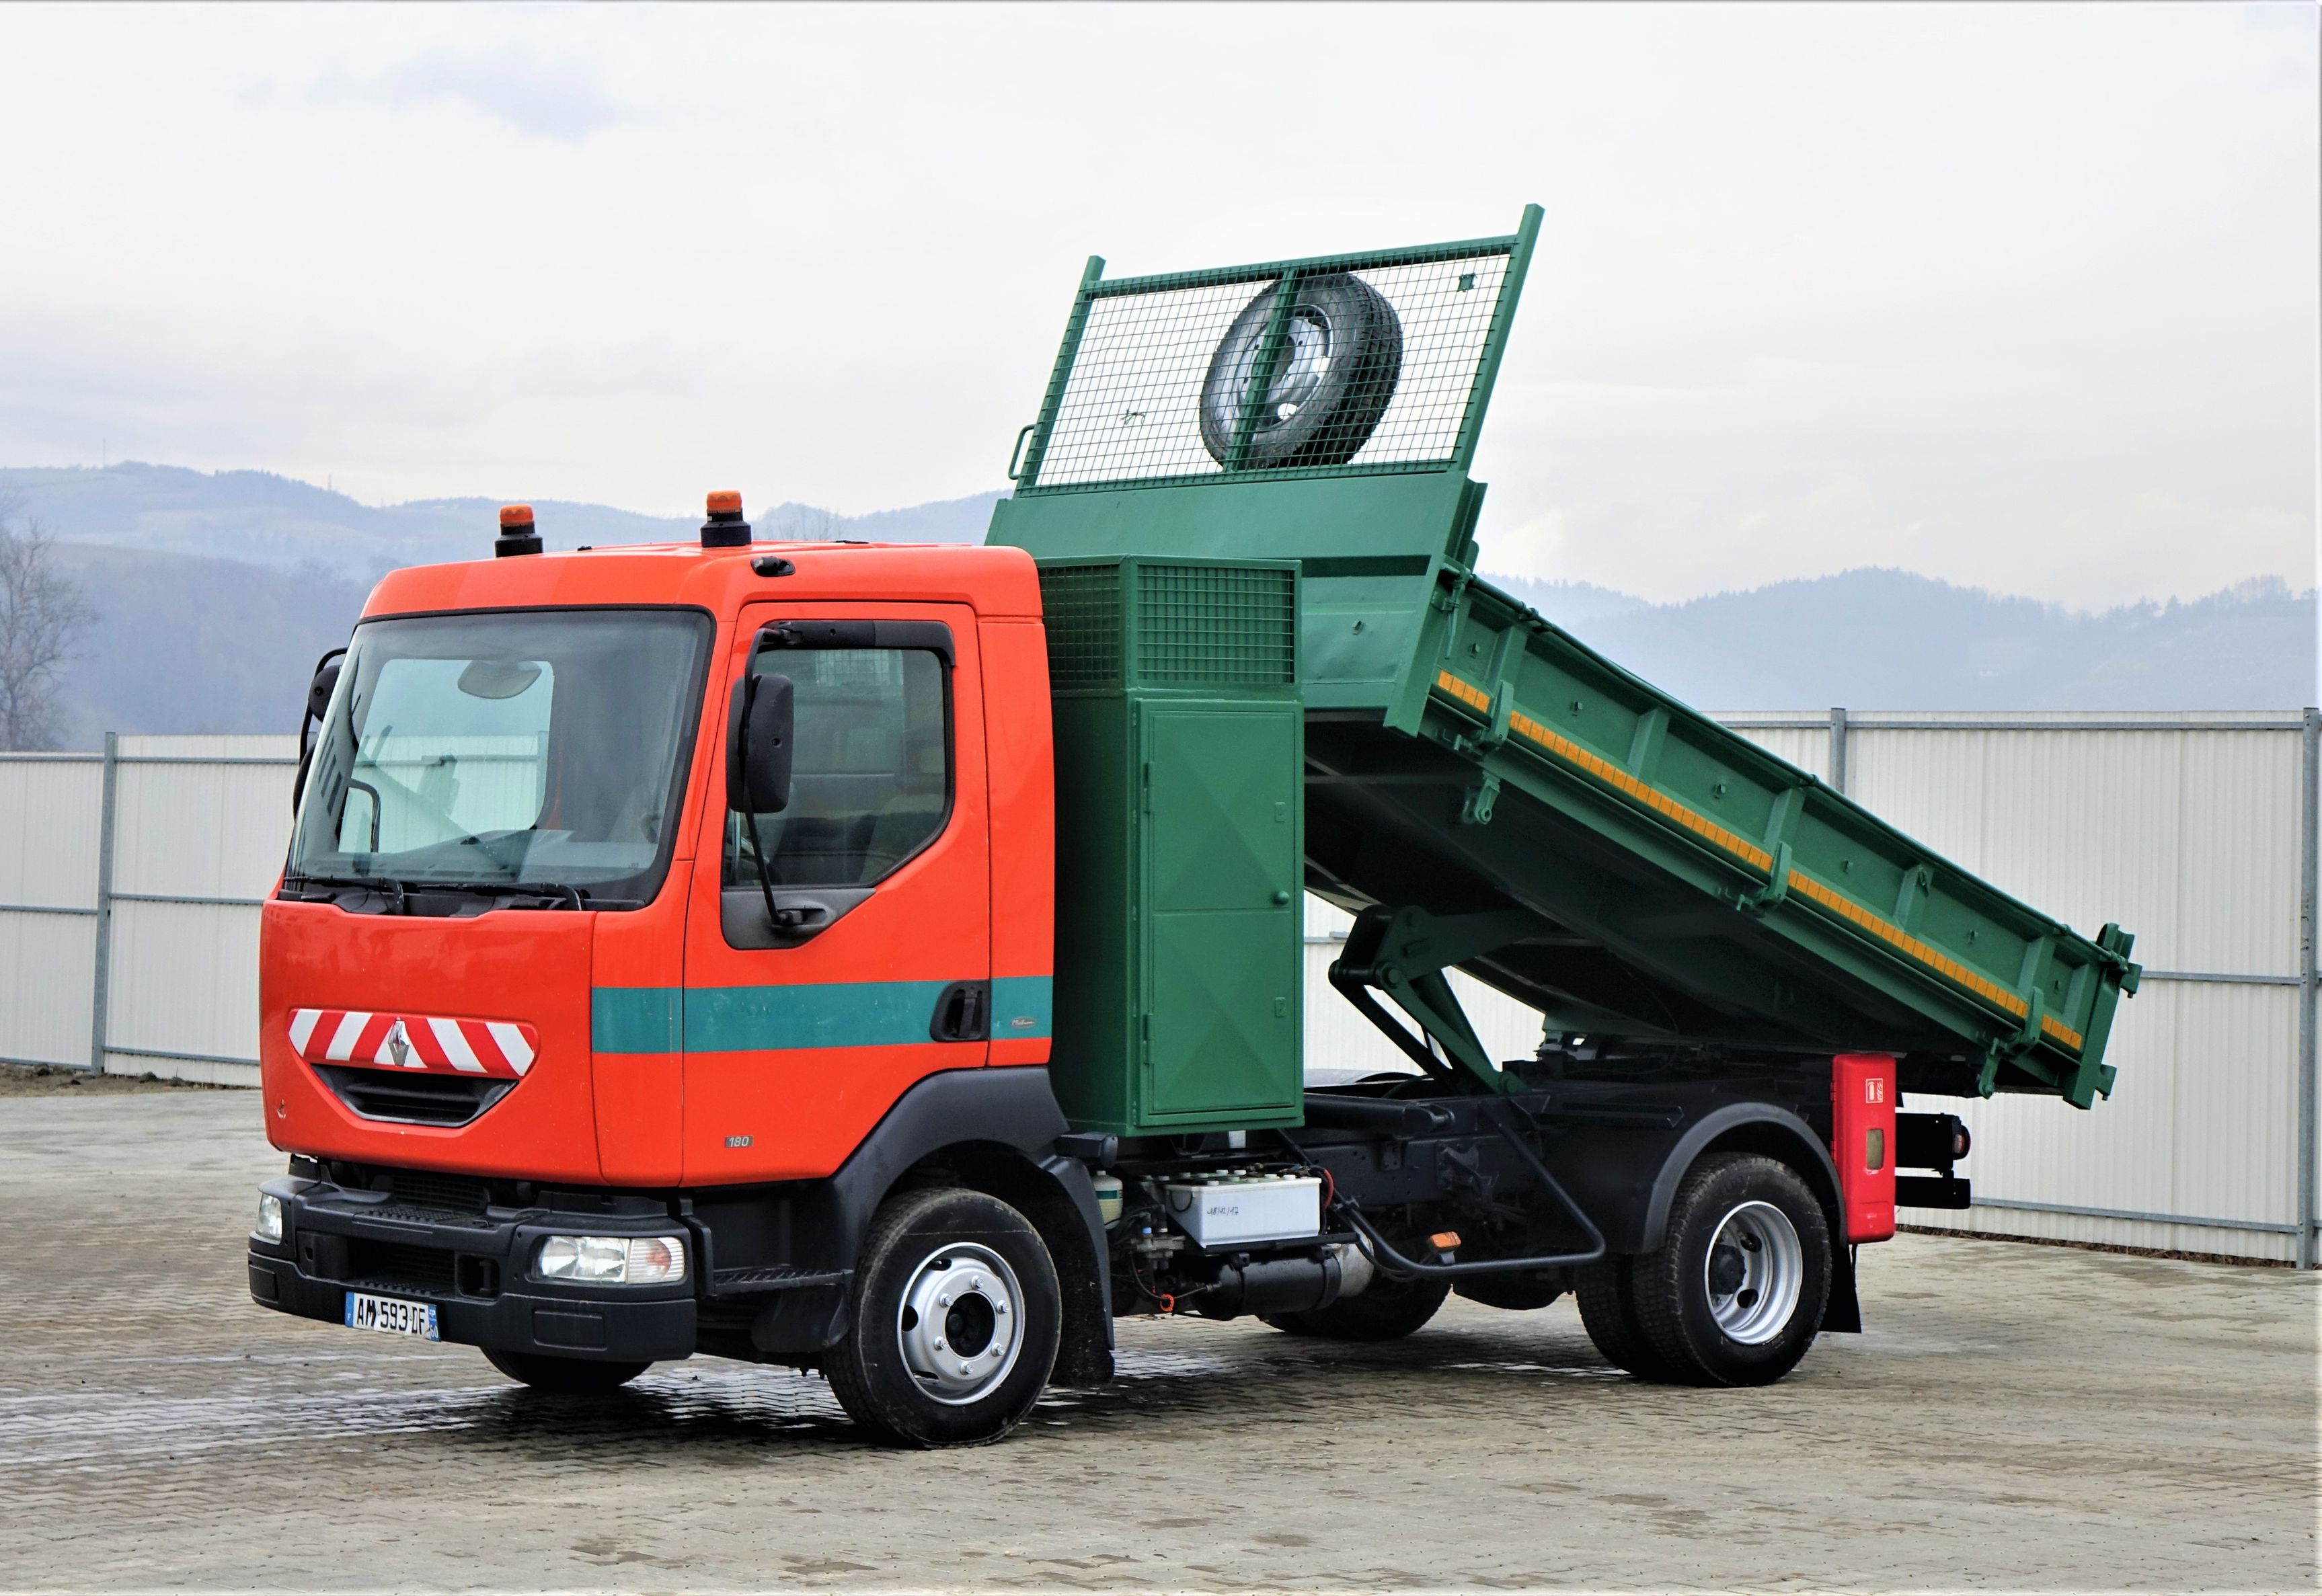 2001-renault-midlum-180-321121-equipment-cover-image